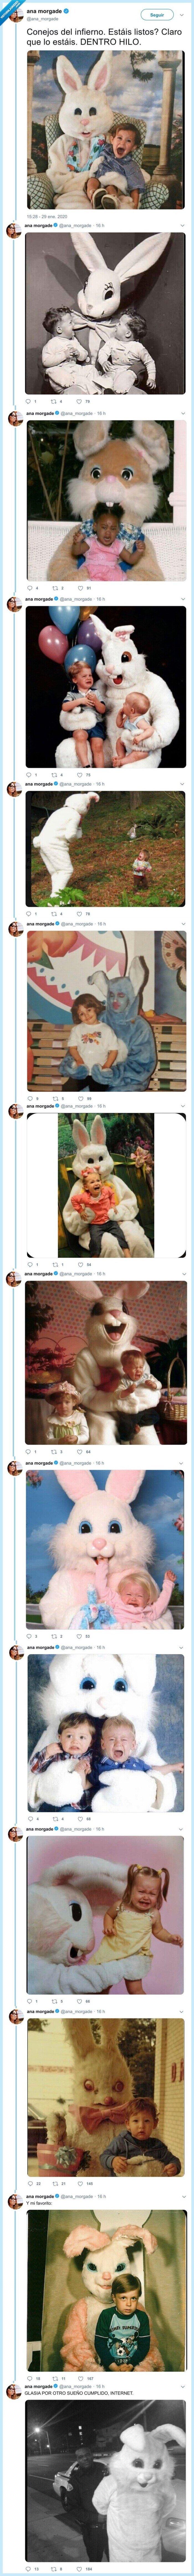 conejos,cuniculifobia,disfraces,mal rollo